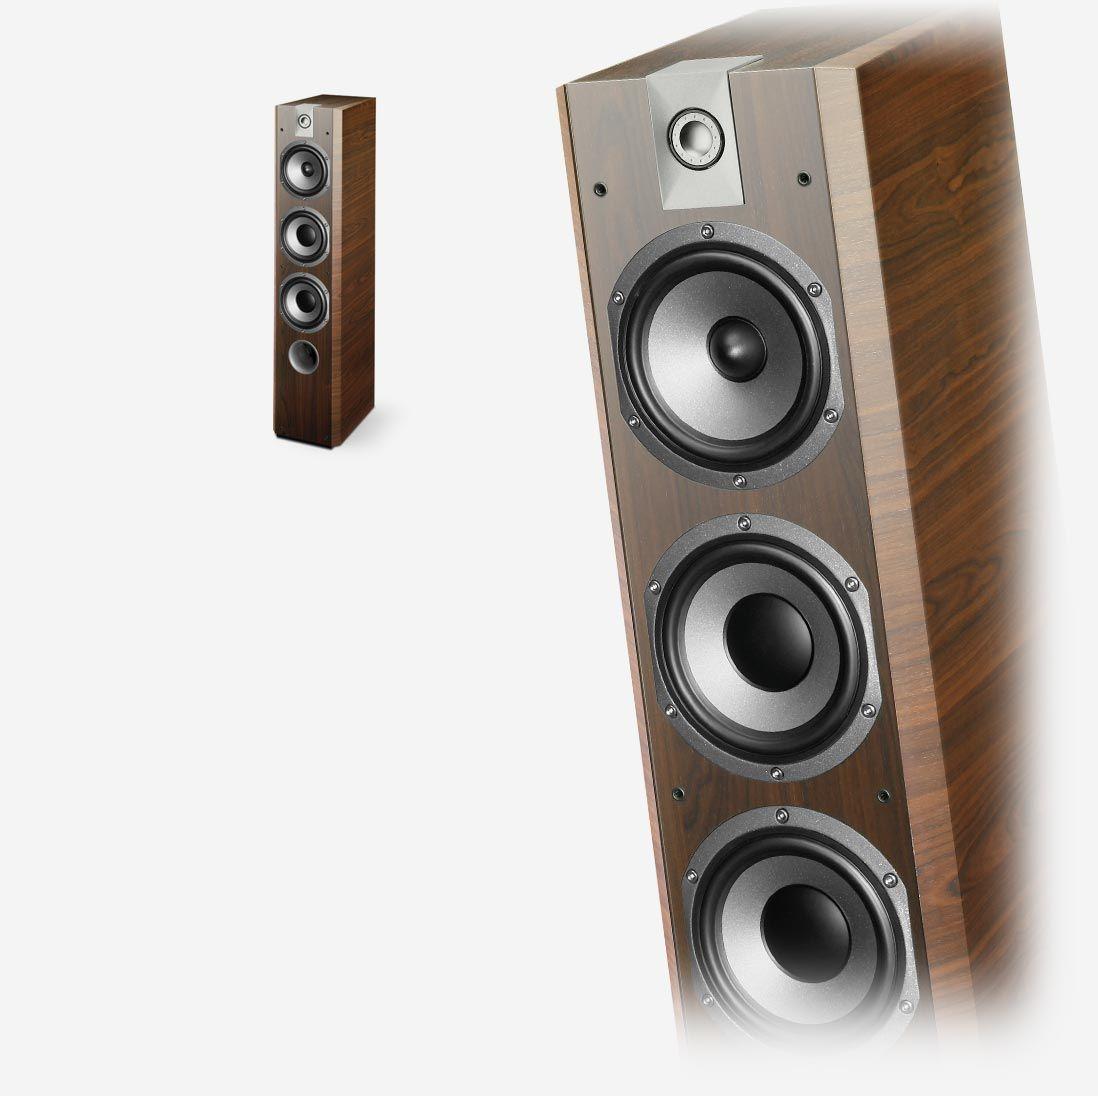 Floorstanding loudspeakers Focal Chorus 726 V for real hifi